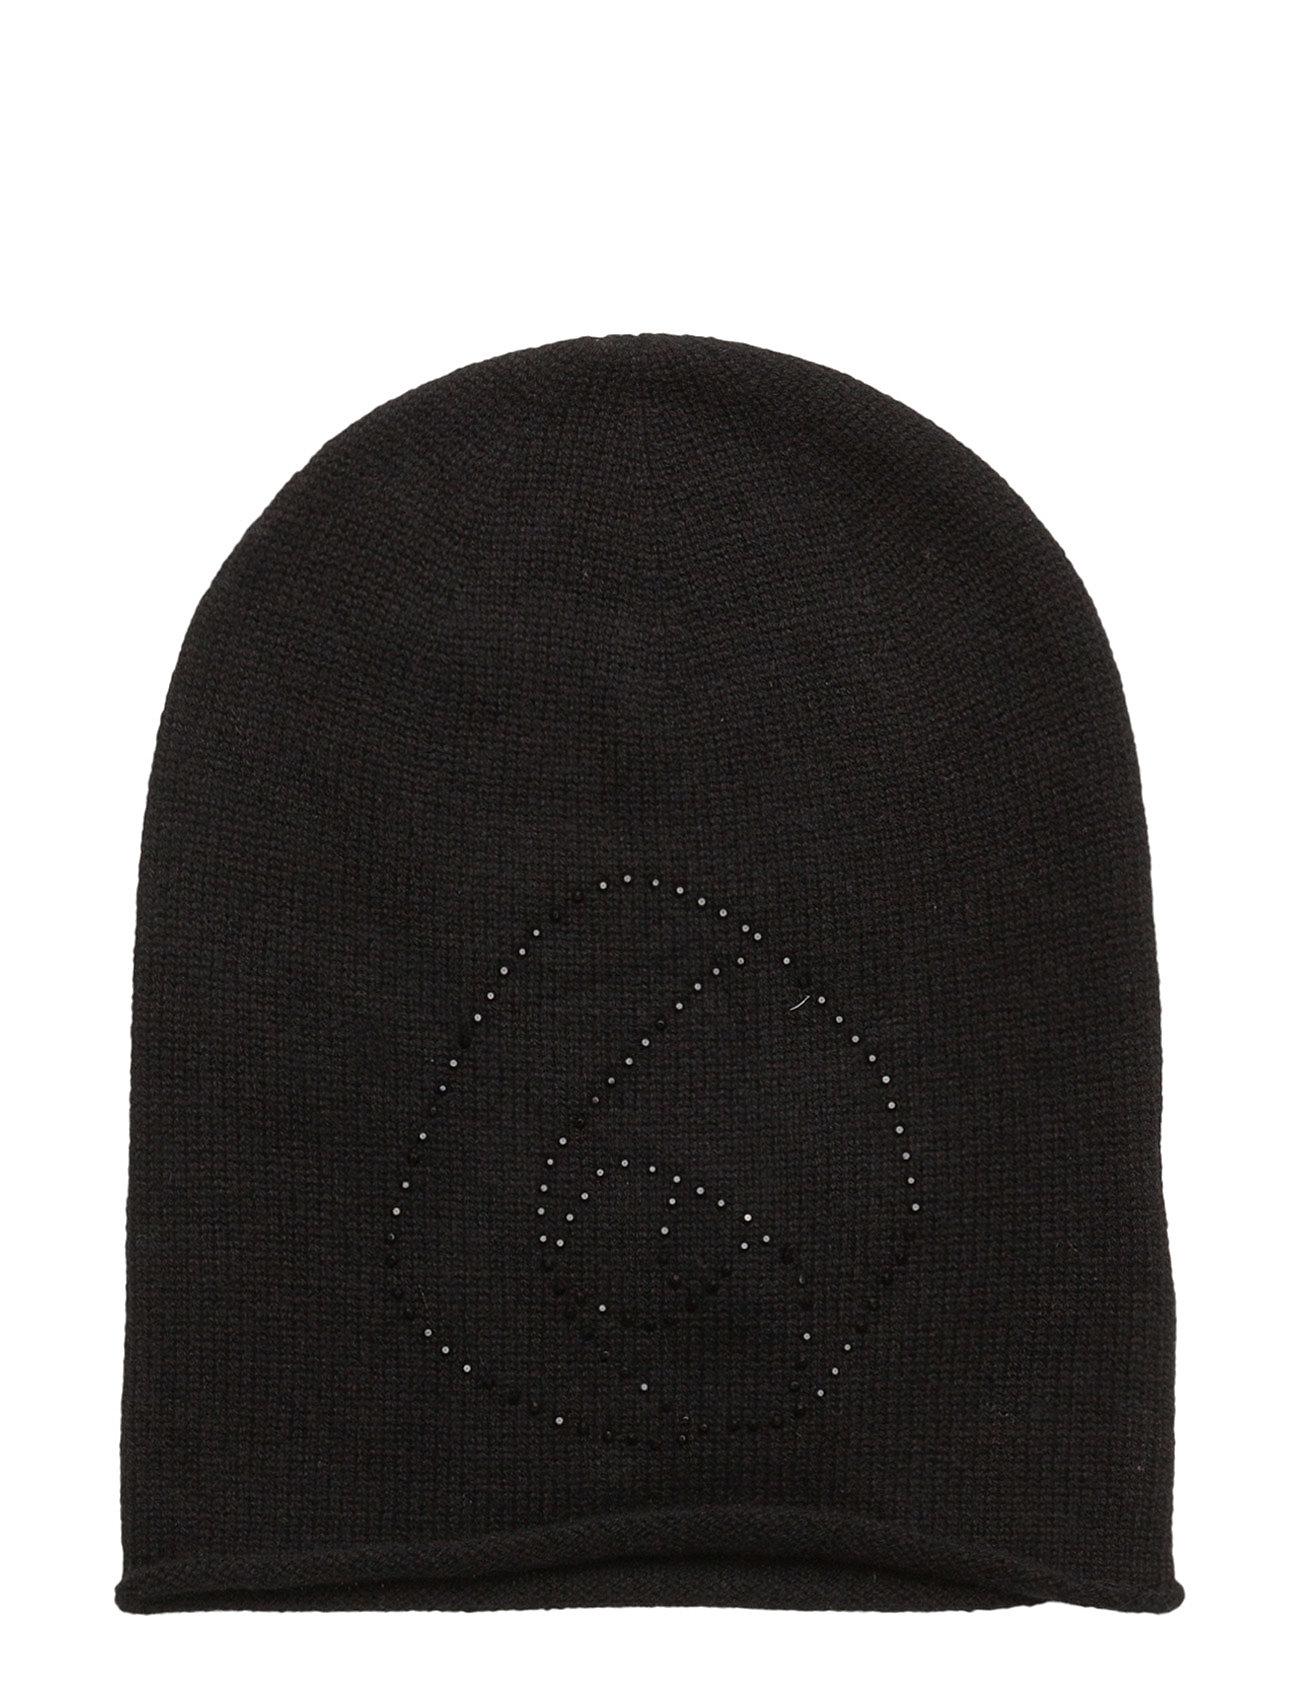 Image of Hat W/Rose Hue Sort ROSEMUNDE (3114230545)